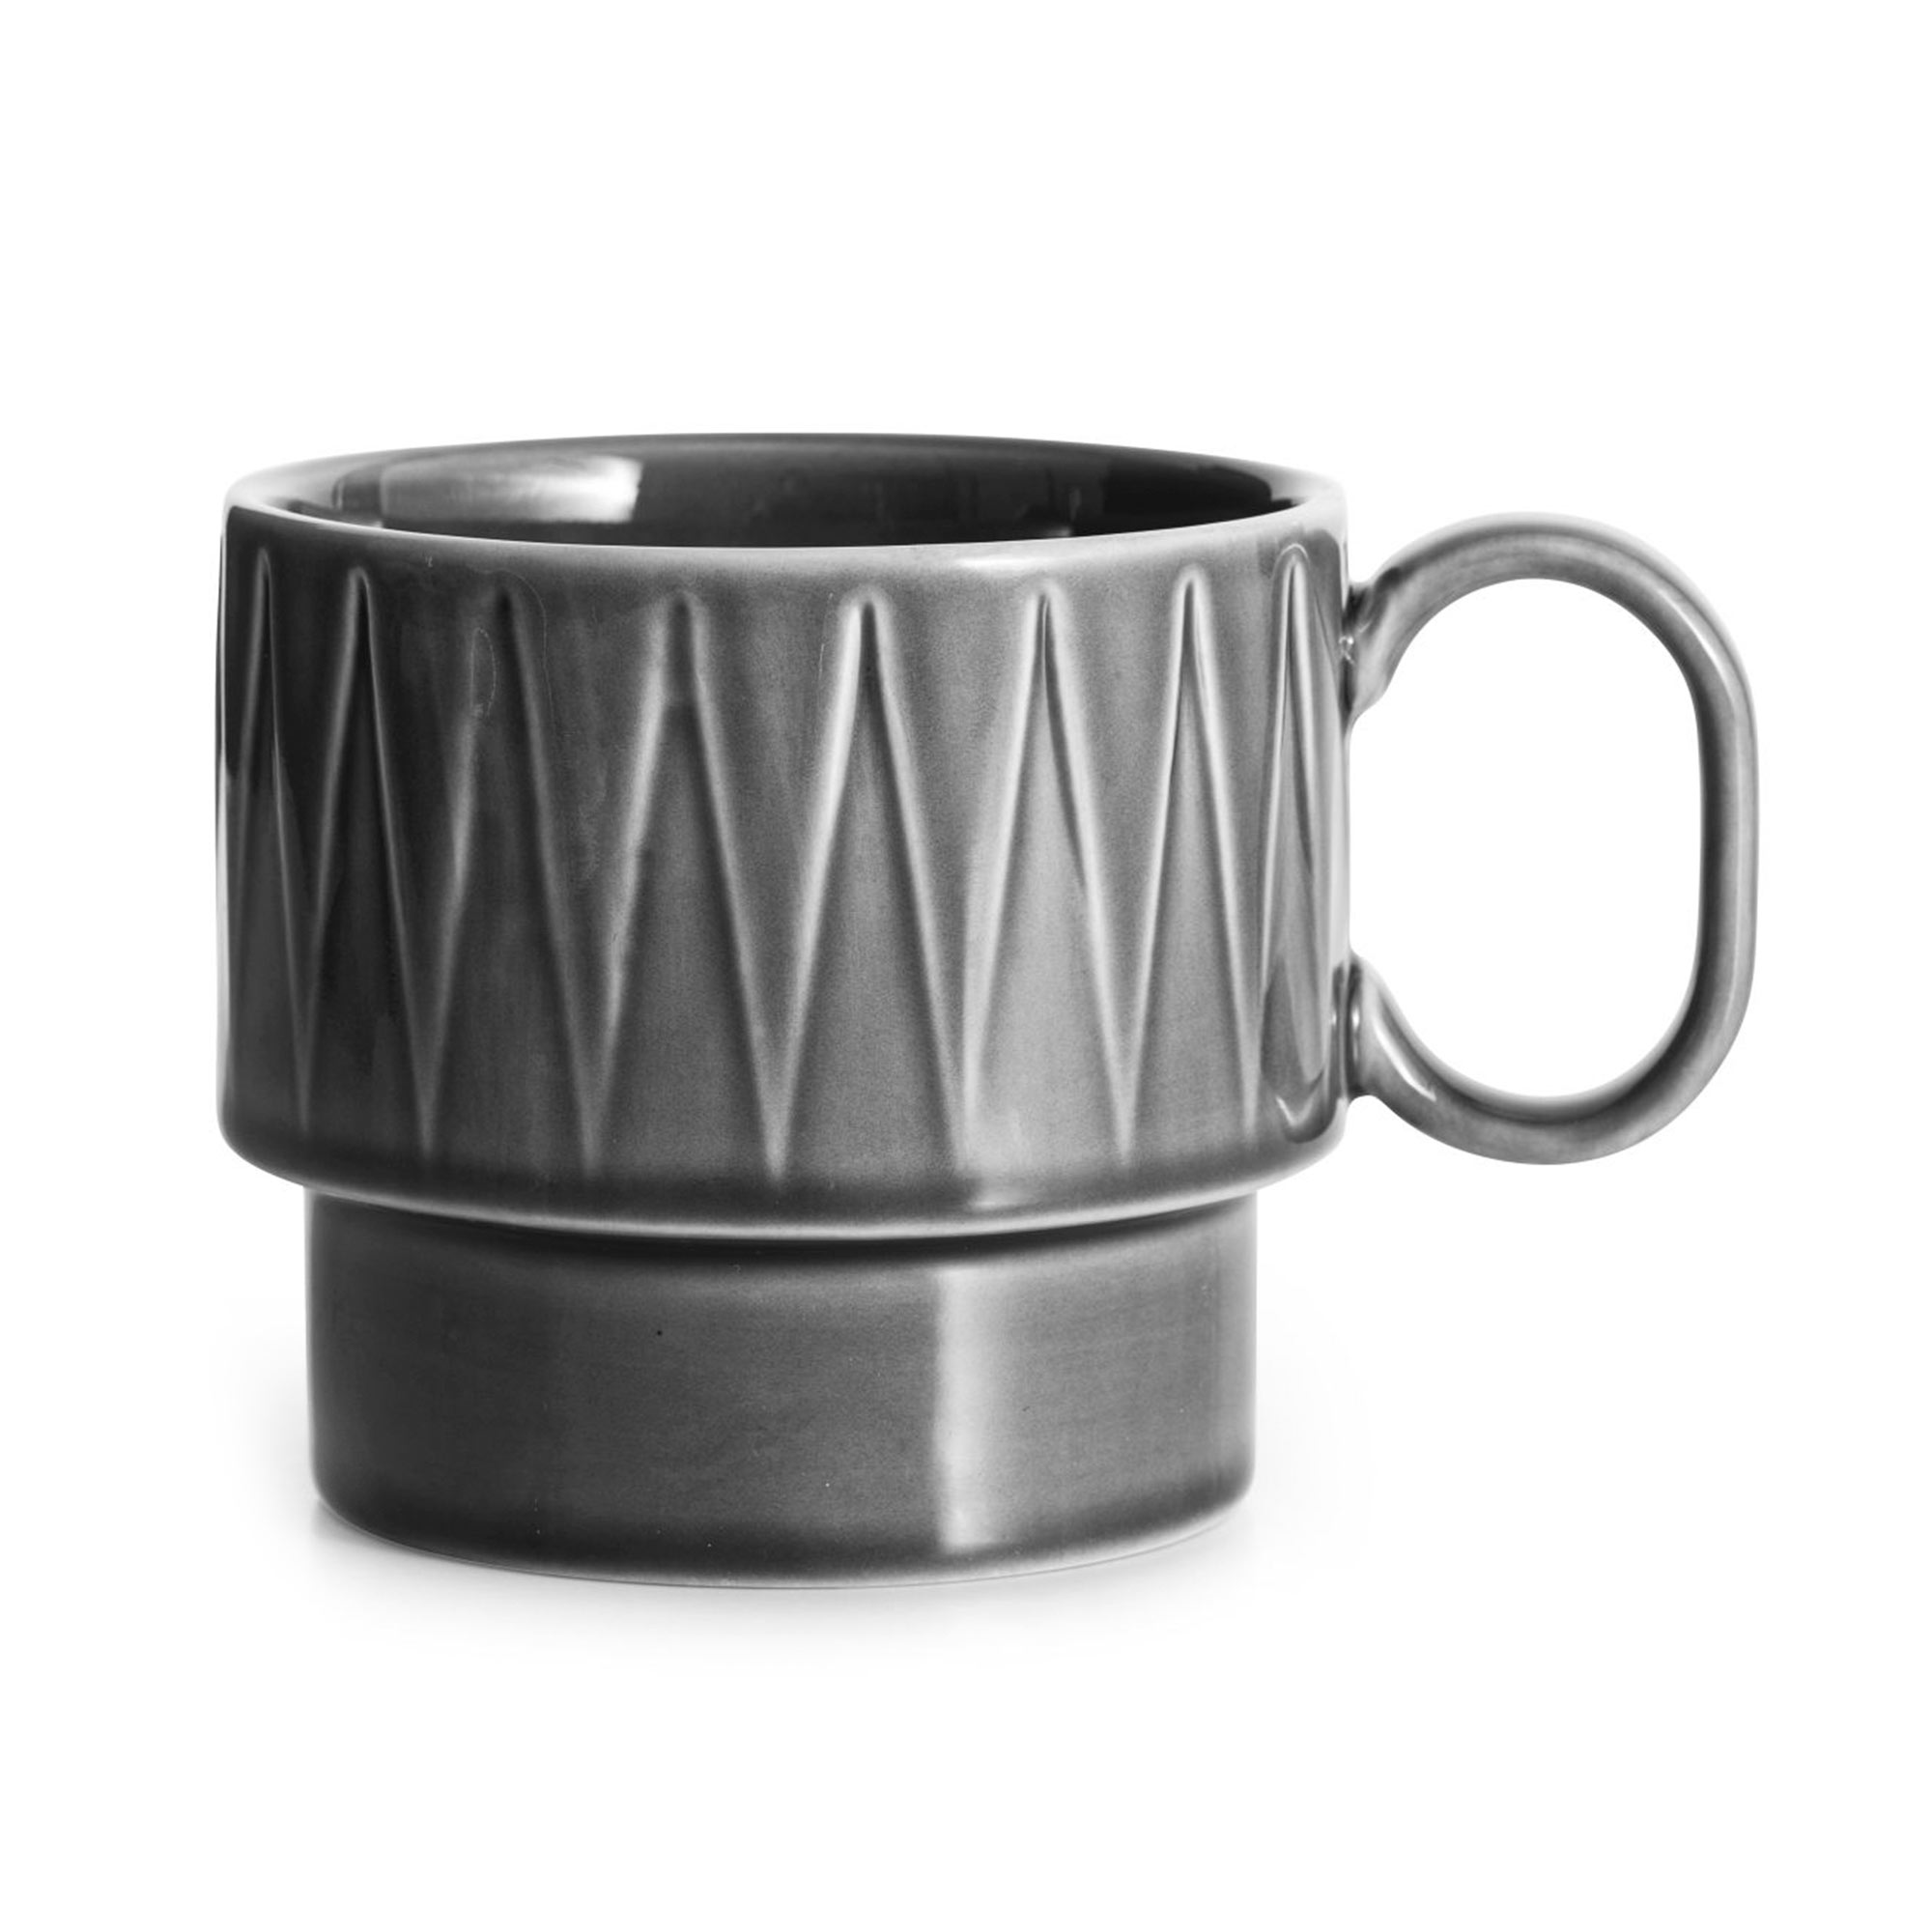 Кружка чайная Sagaform Coffee & More серая 400 мл